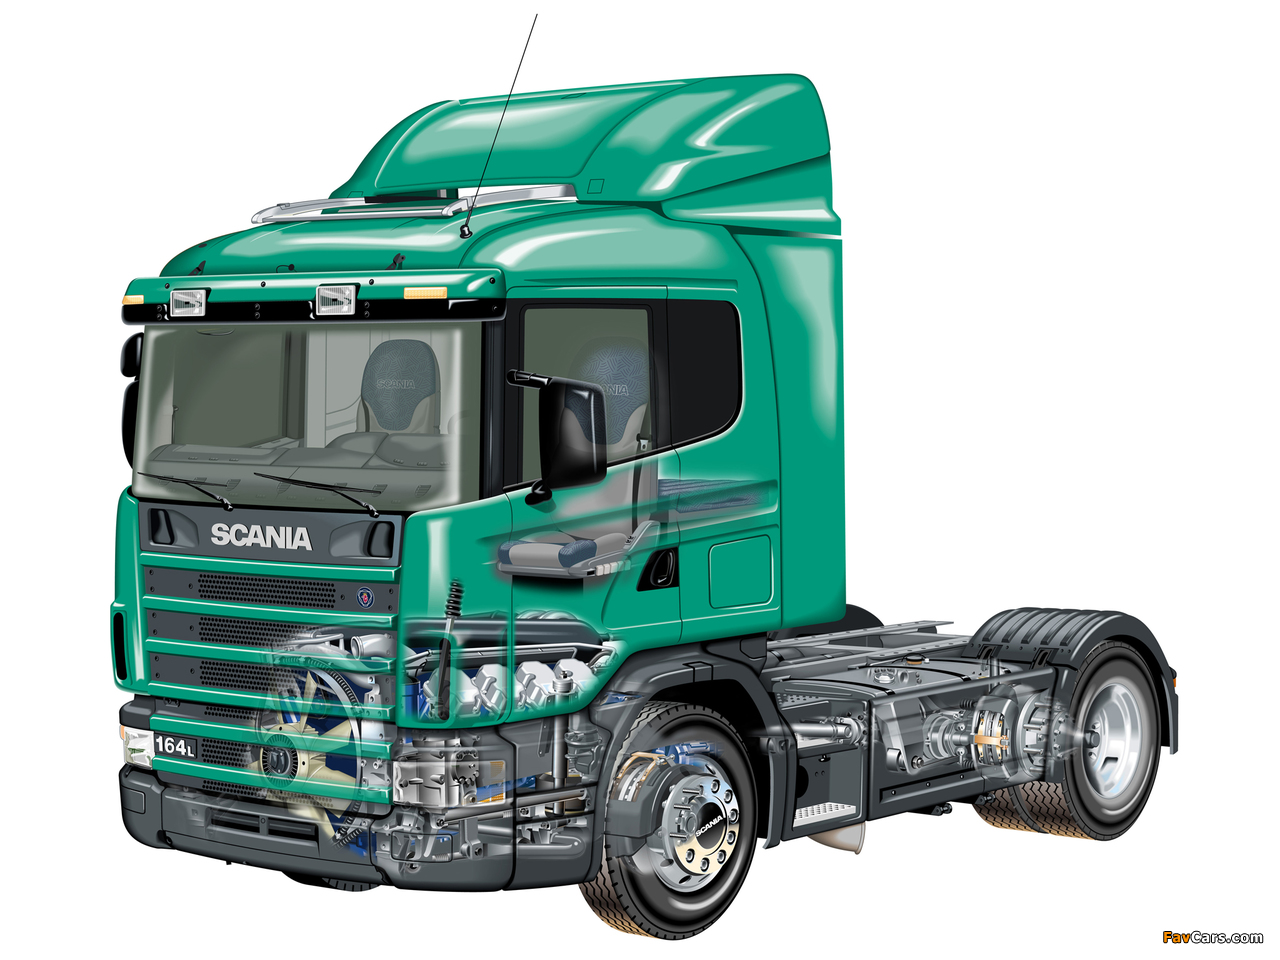 Scania R164L 580 4x2 1995–2004 photos (1280 x 960)